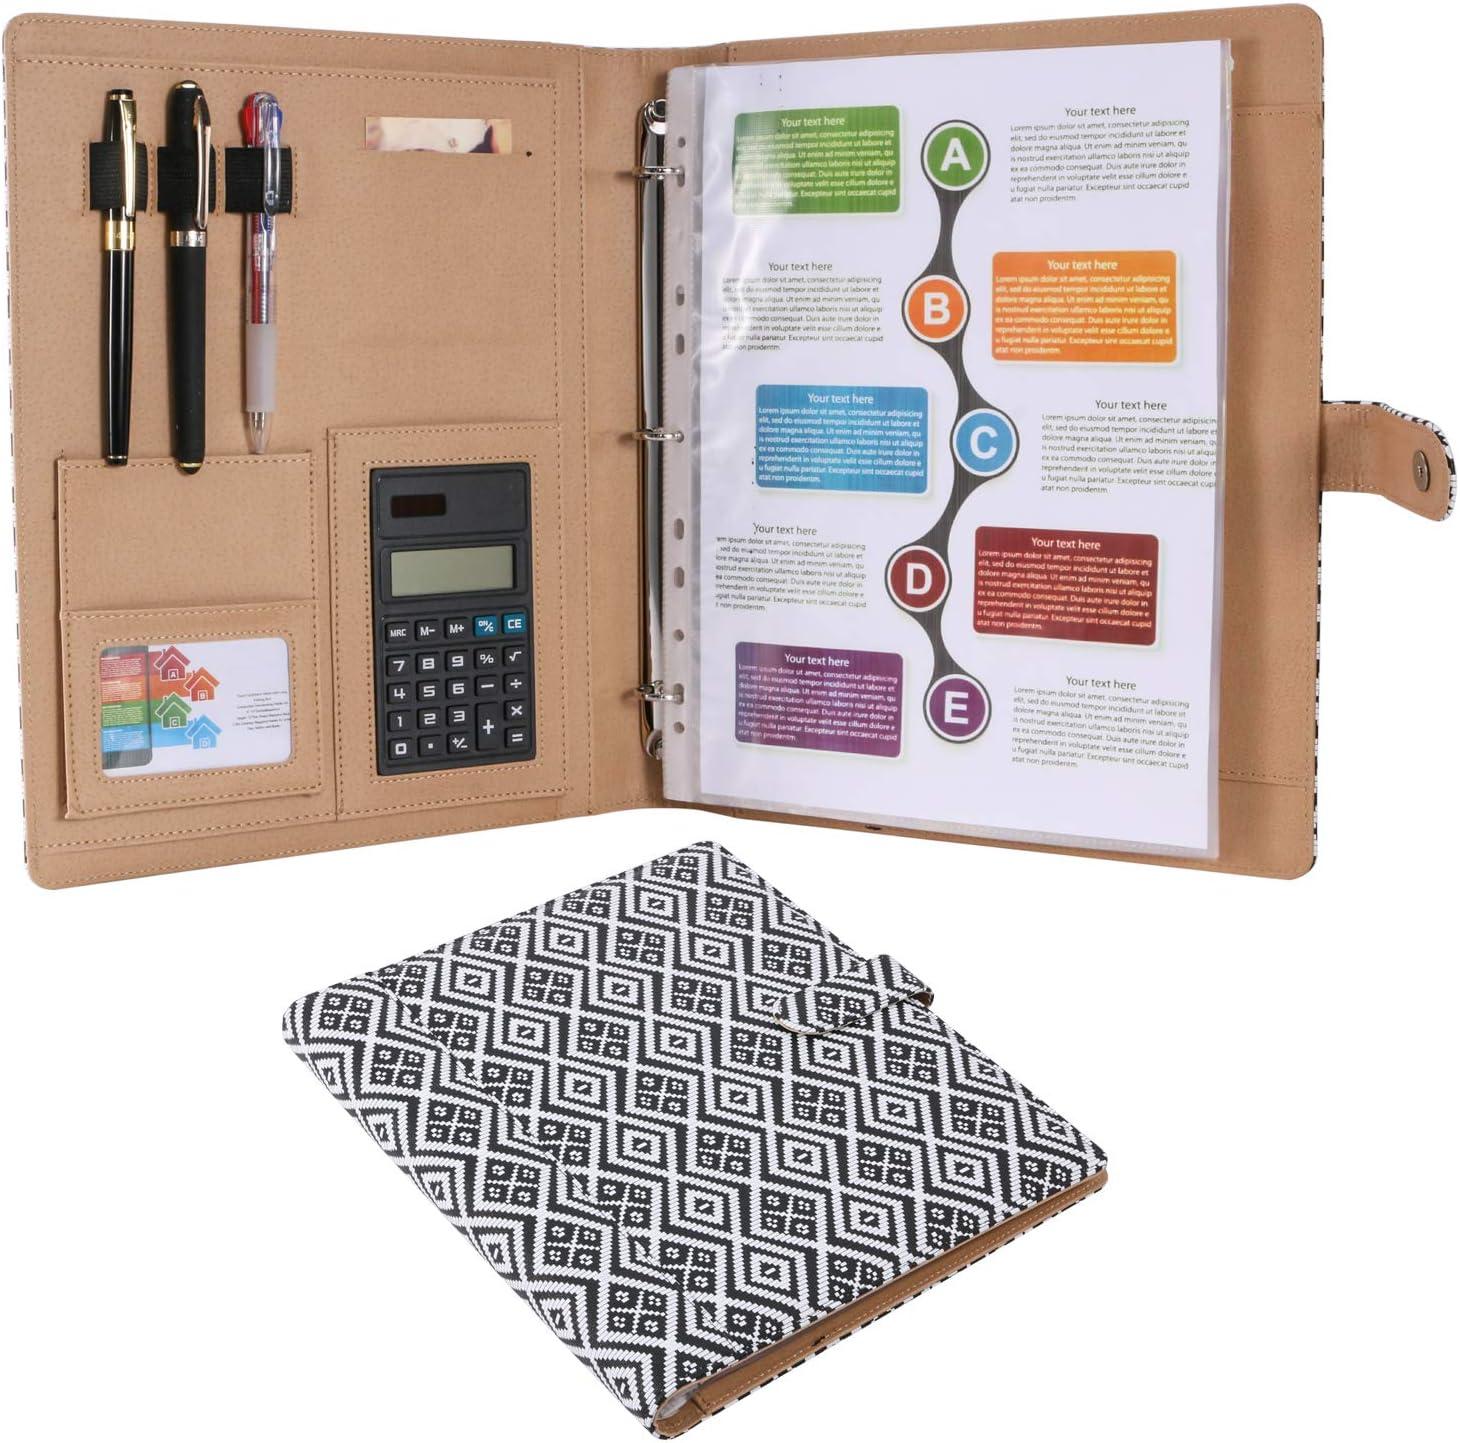 Z PLINRISE High Grade Multifunction Letter Size Padfolio//Resume Portfolio Folder-Document Organizer//Business Card Holder with Calculator and 8 File Pockets